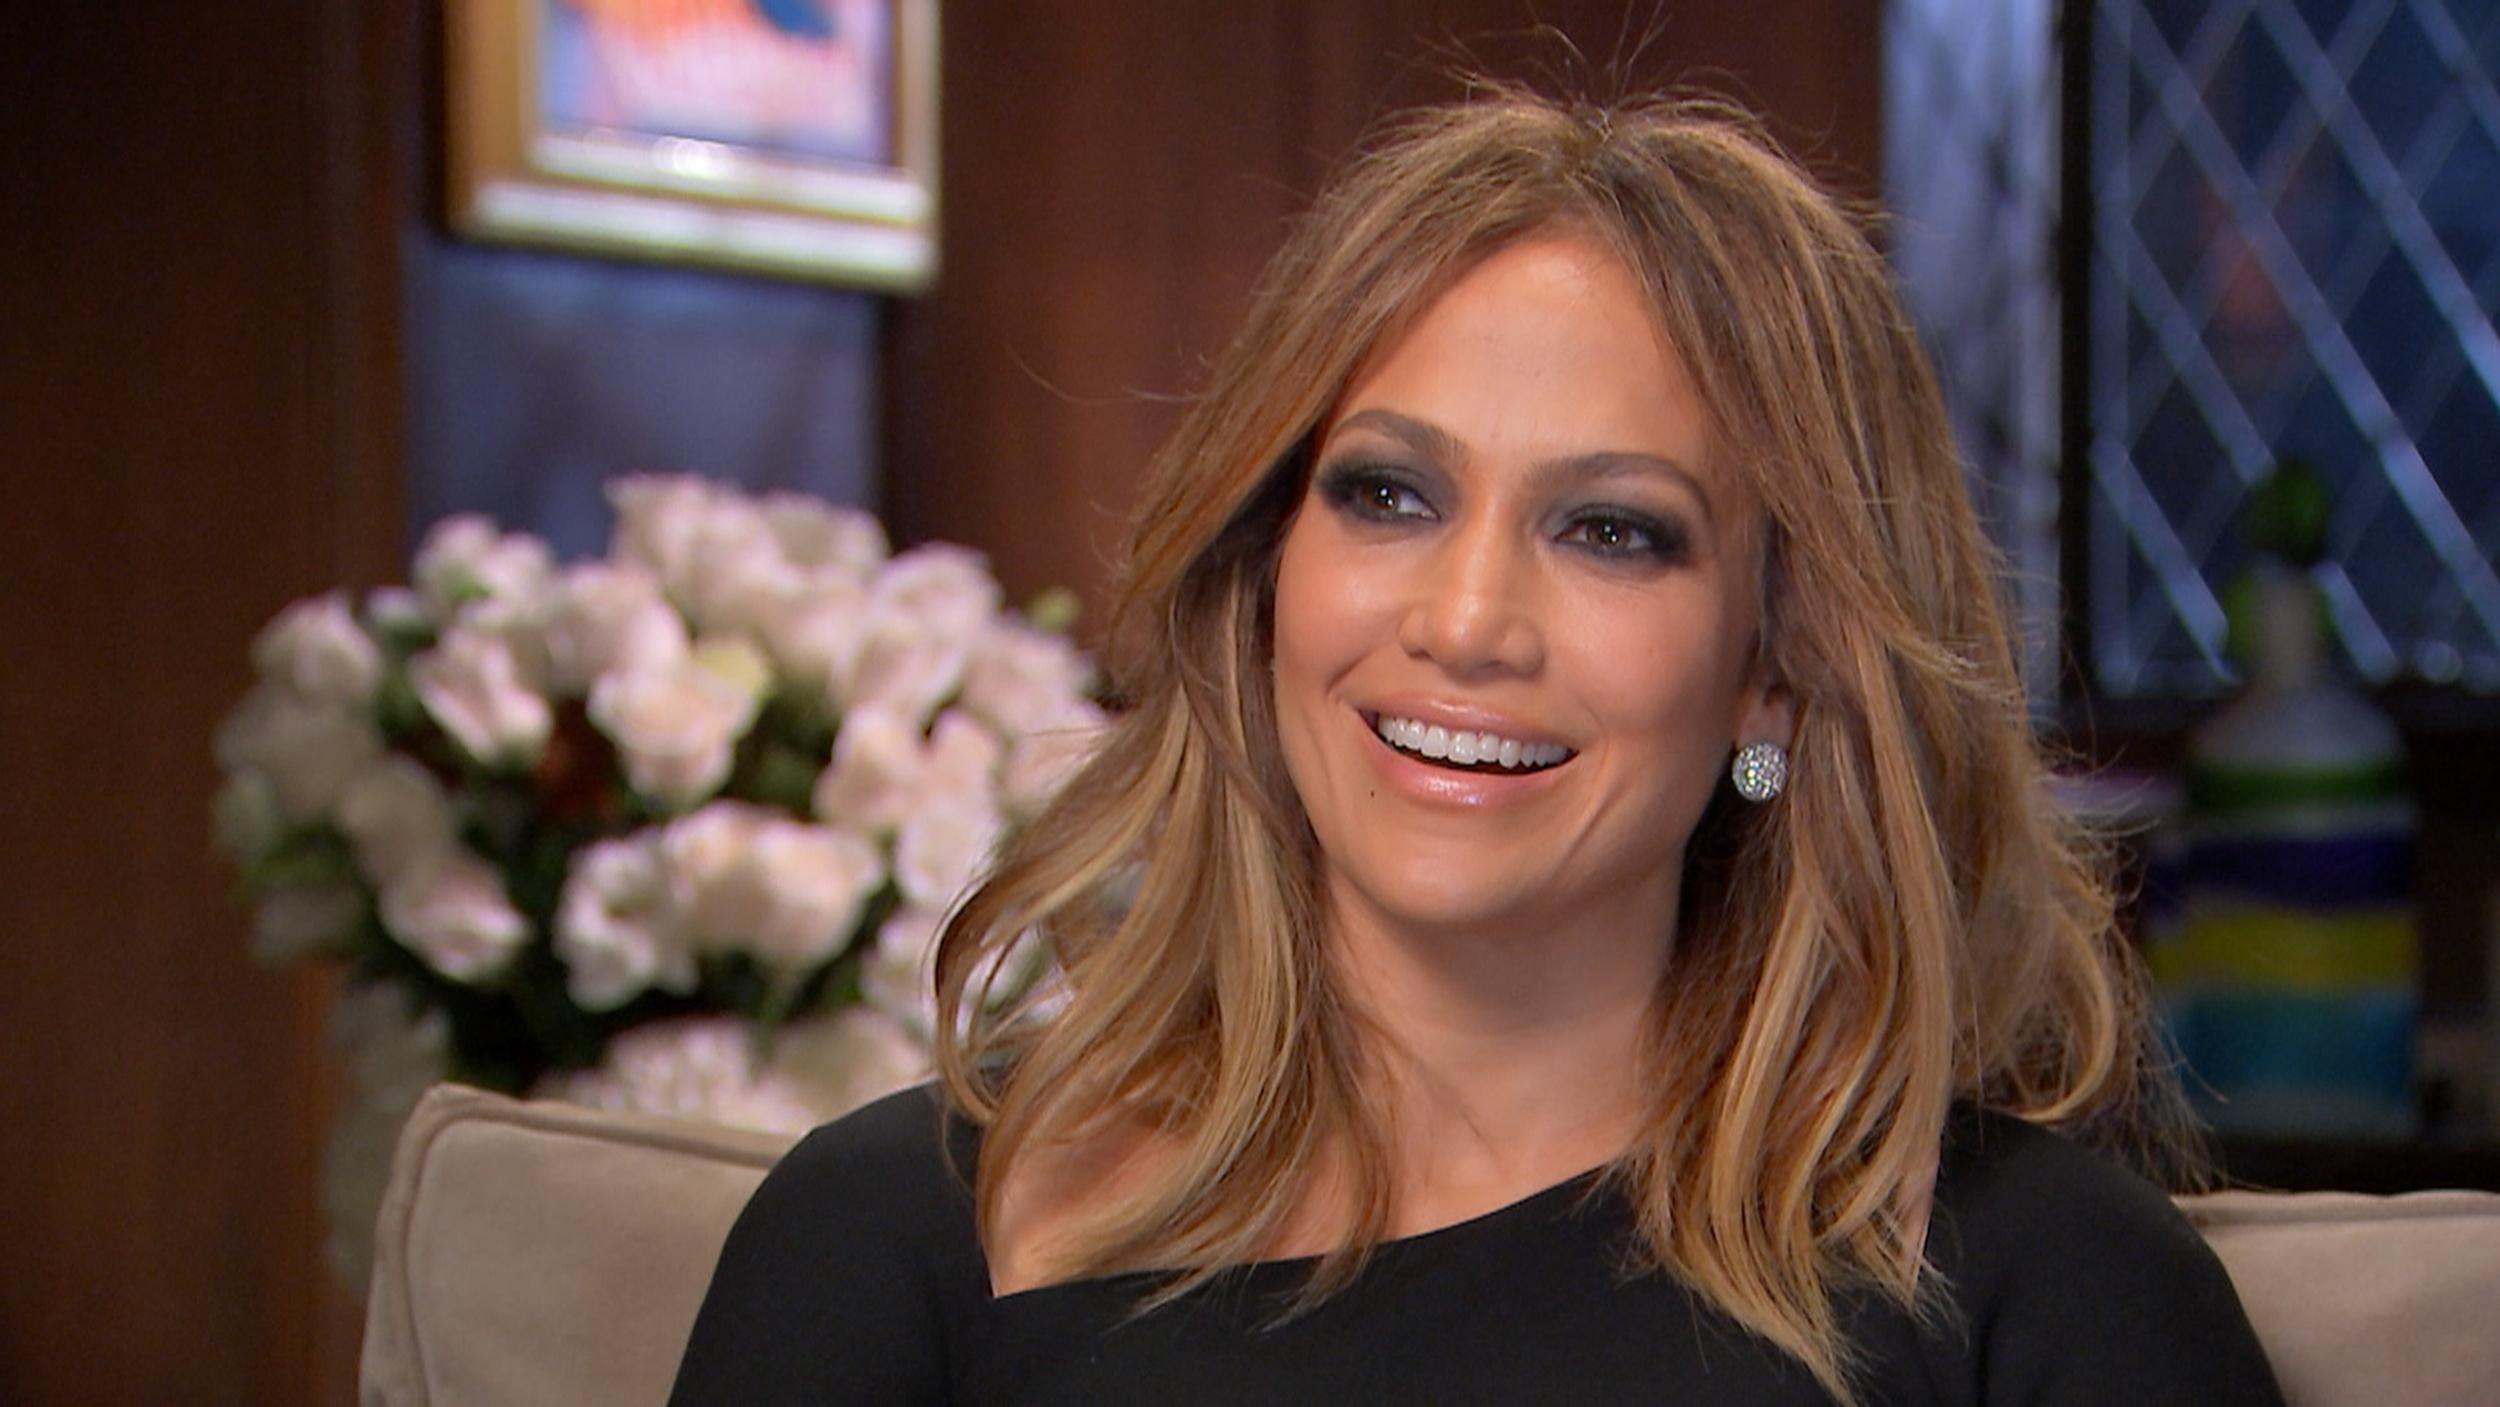 Jennifer Lopez: Jennifer Lopez Talks Twins Max And Emme: 'They Just Made